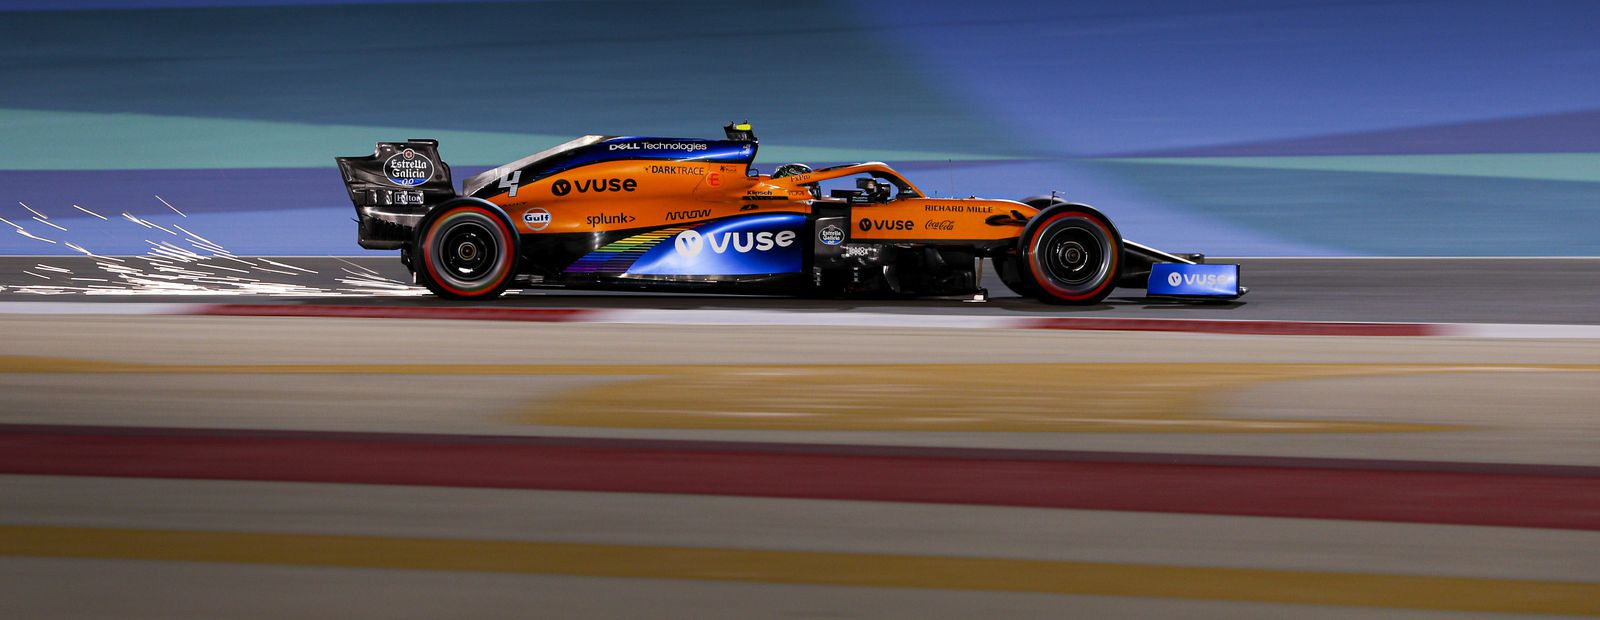 Bahrain Grand Prix 2020 - Qualifying